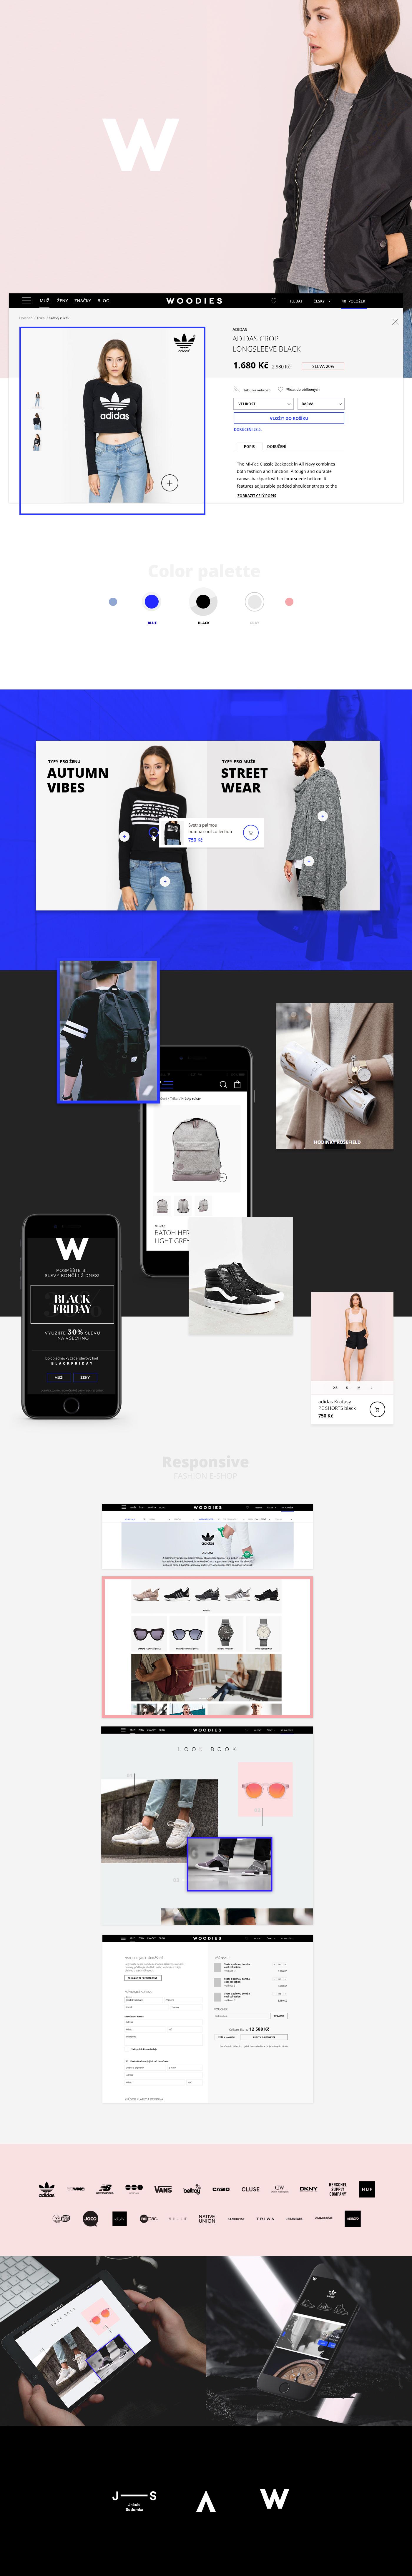 e-commerce e-shop design user experience Fashion  Czech UI Webdesign store online store